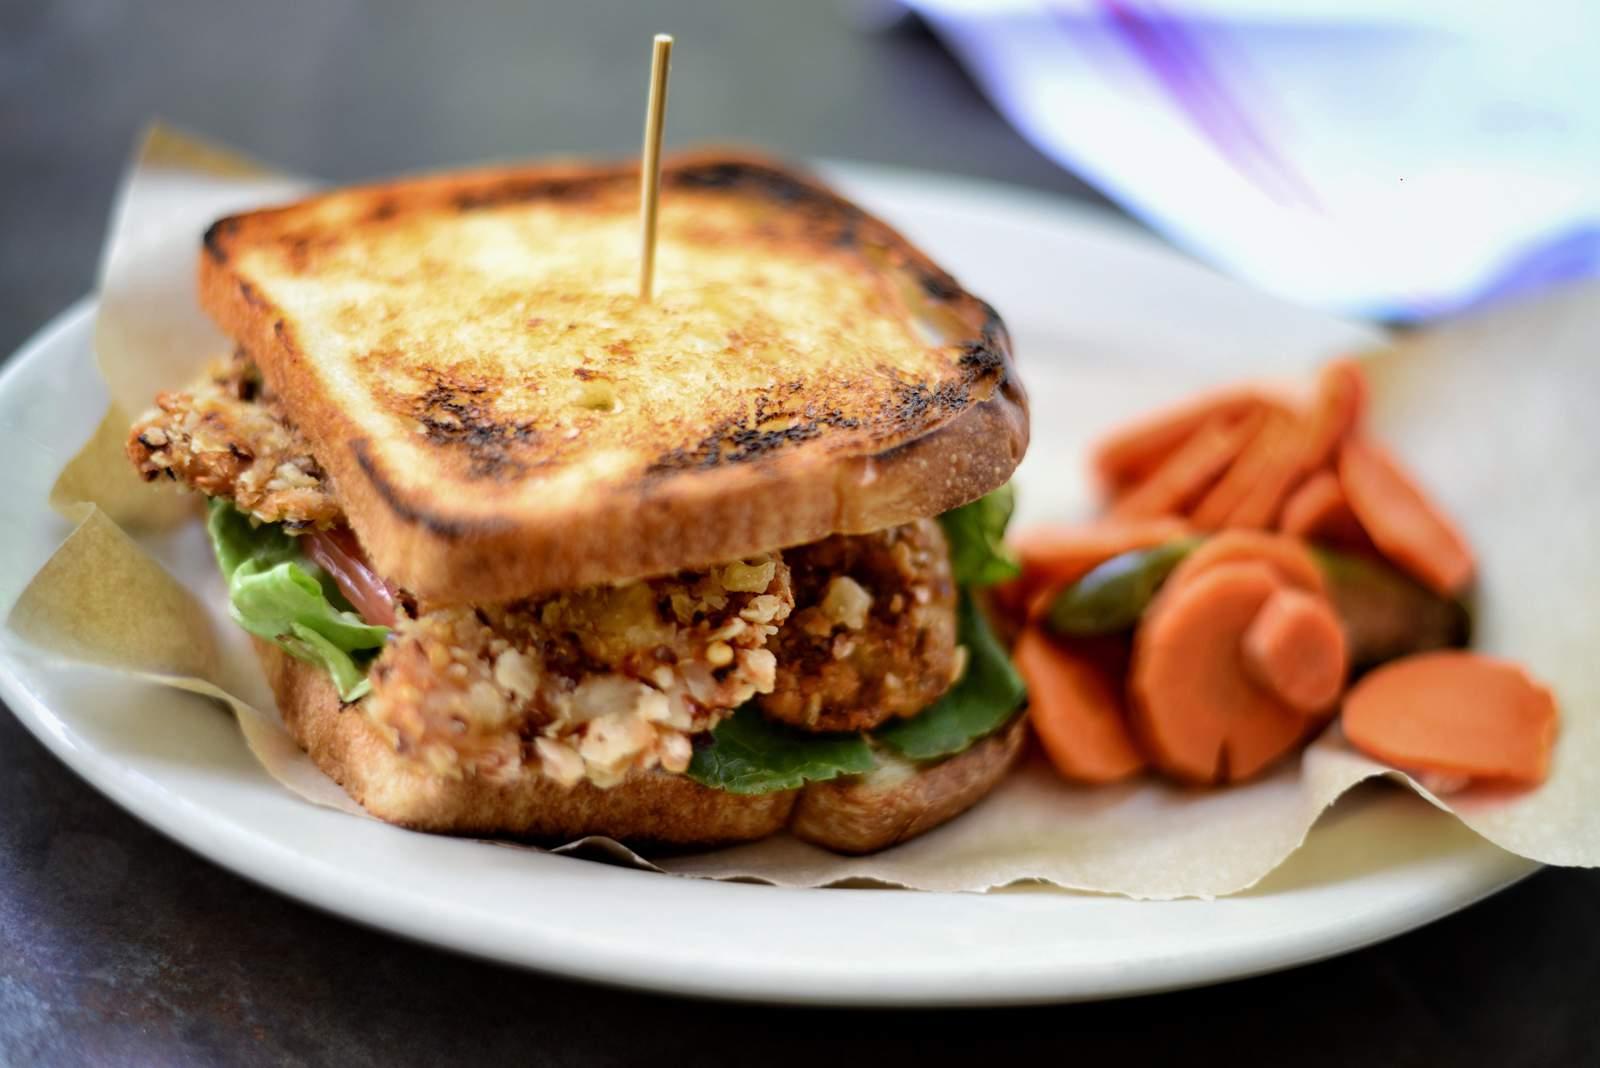 San Antonio restaurants offering seafood specials during Lent season